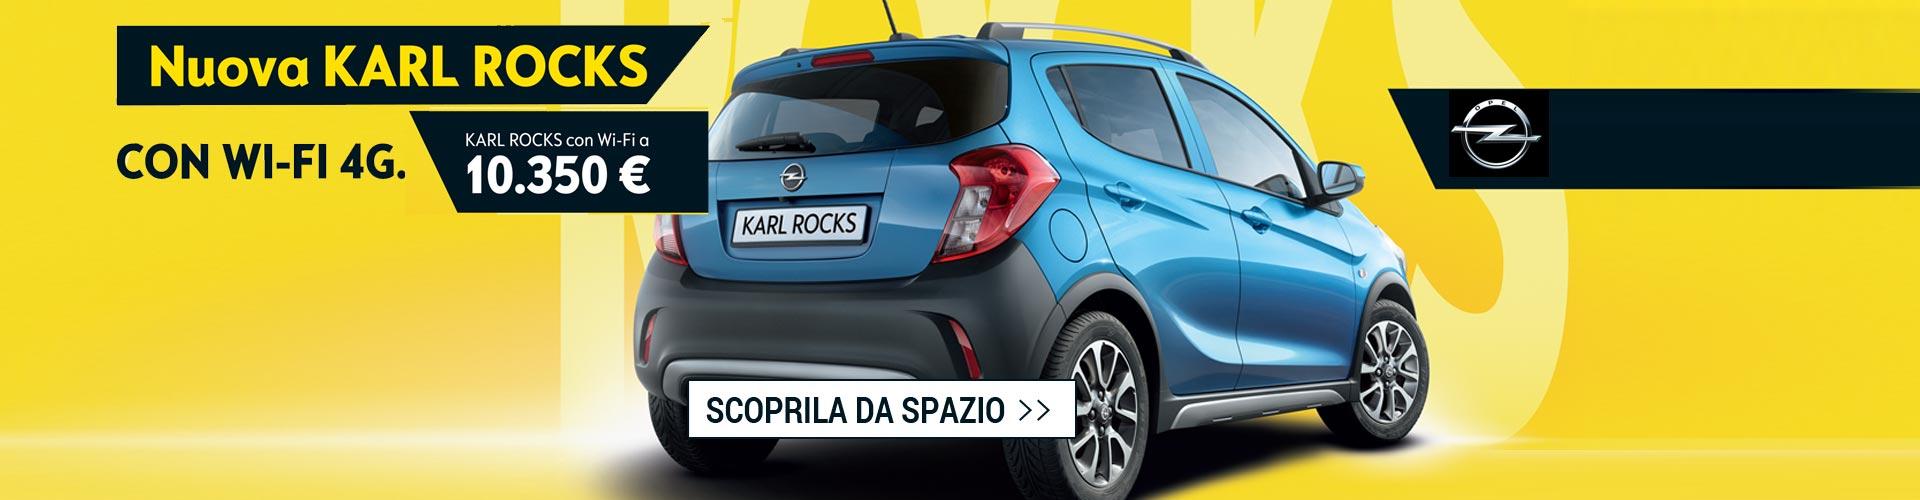 Opel Karl Rocks da Spazio a Torino